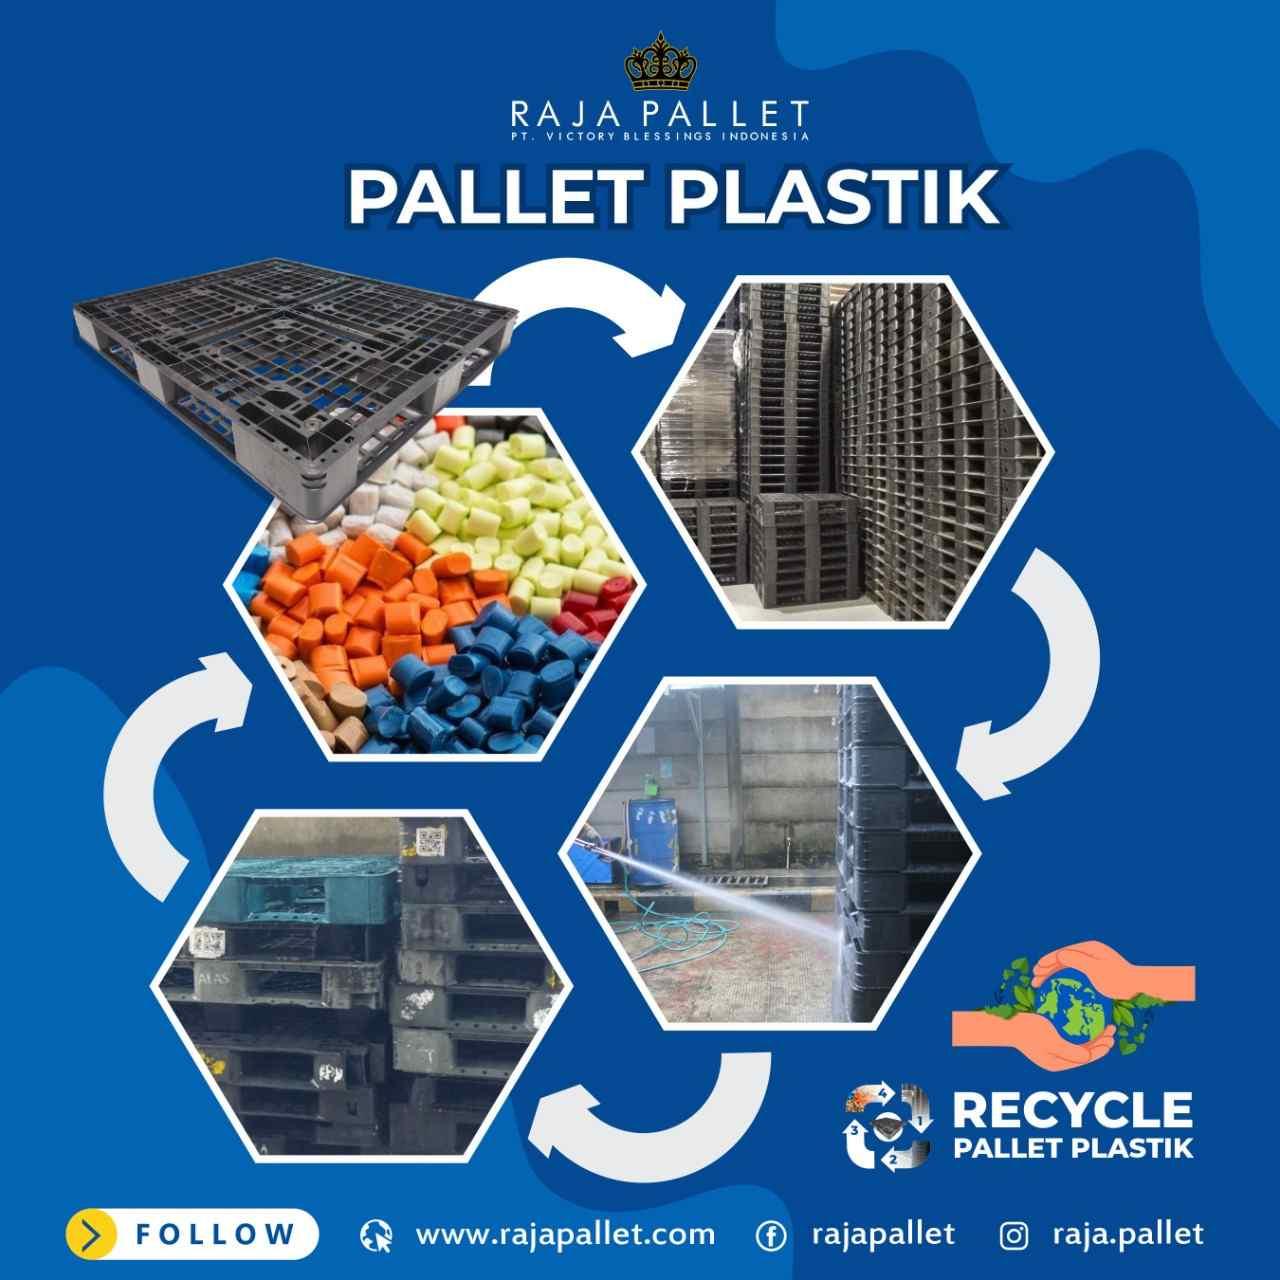 pallet plastik ramah lingkungan harga murah